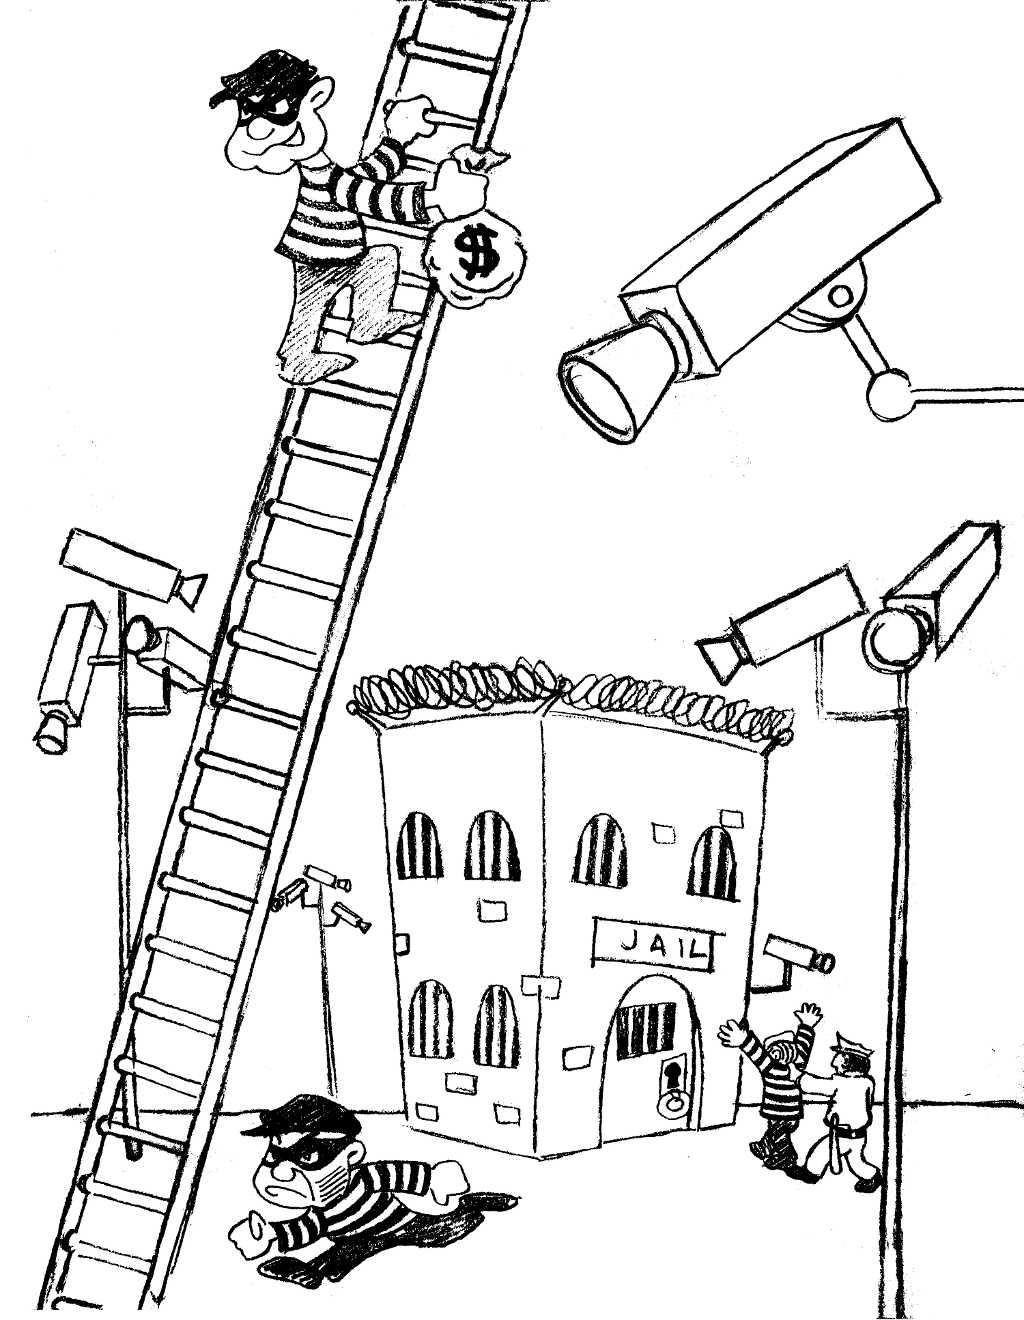 1024x1320 Mcveillance Mcdonaldized Surveillance As A Monopolization Of Sight